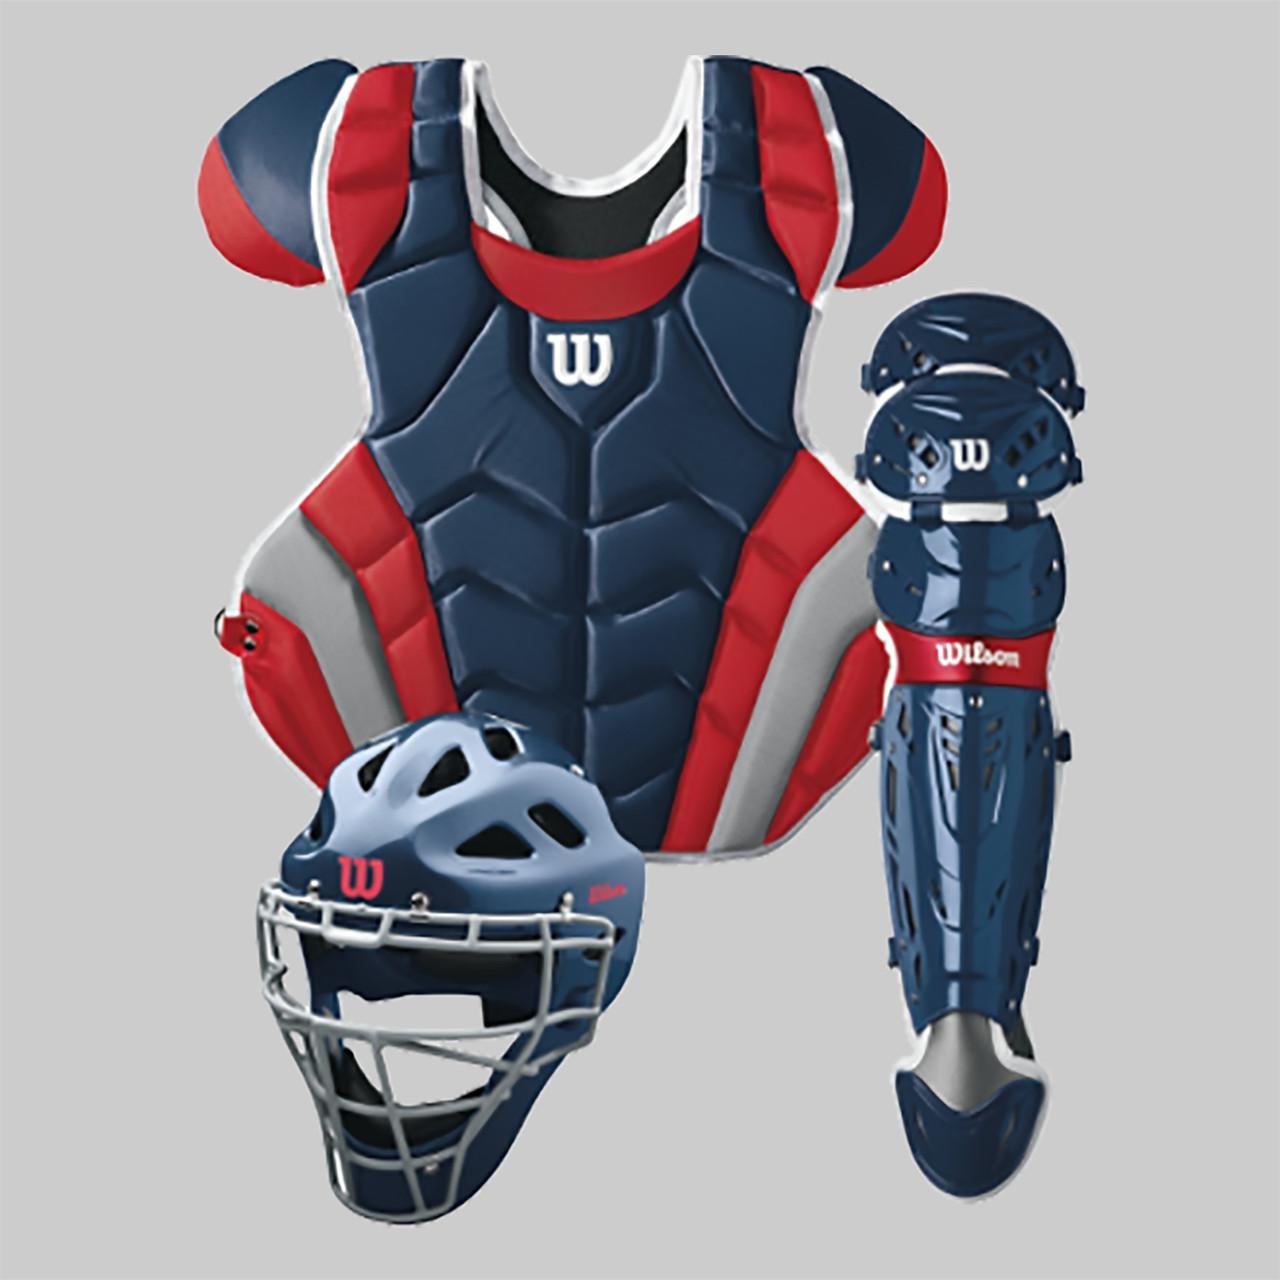 ... Wilson C1K Intermediate Baseball Catcher s Gear Kit  977626a3086e